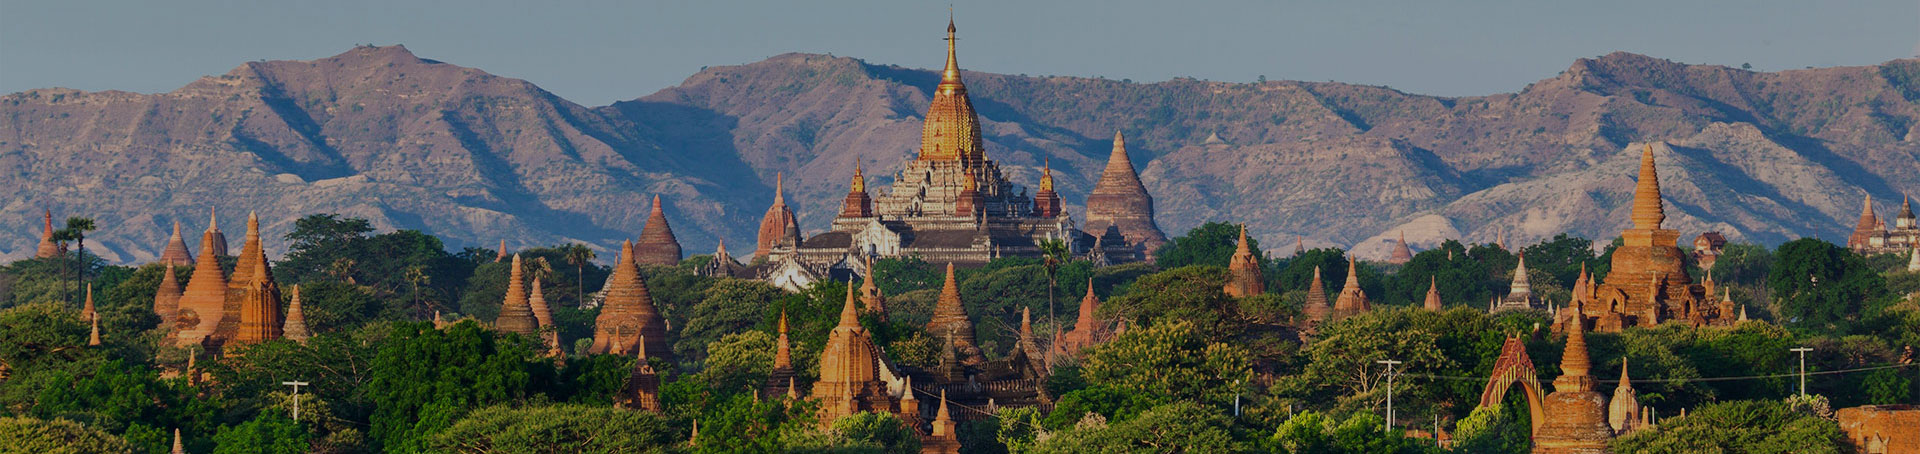 Birmanie, temples de Yangon